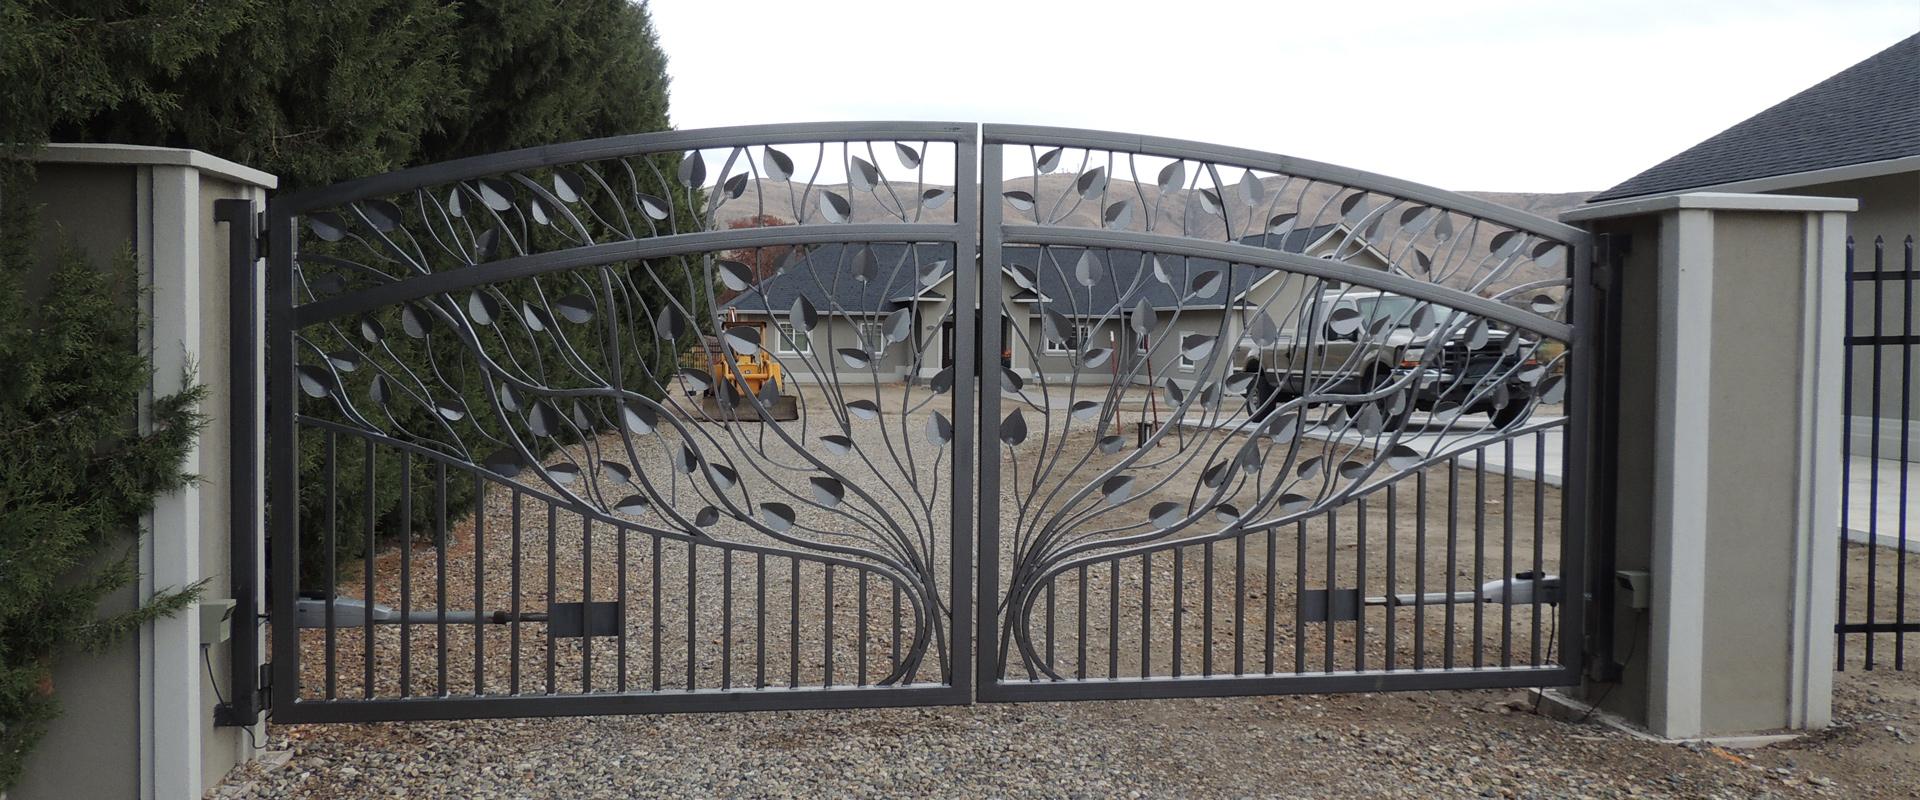 Metal Fence, Gates and Custom Metal Work: Classic Welding